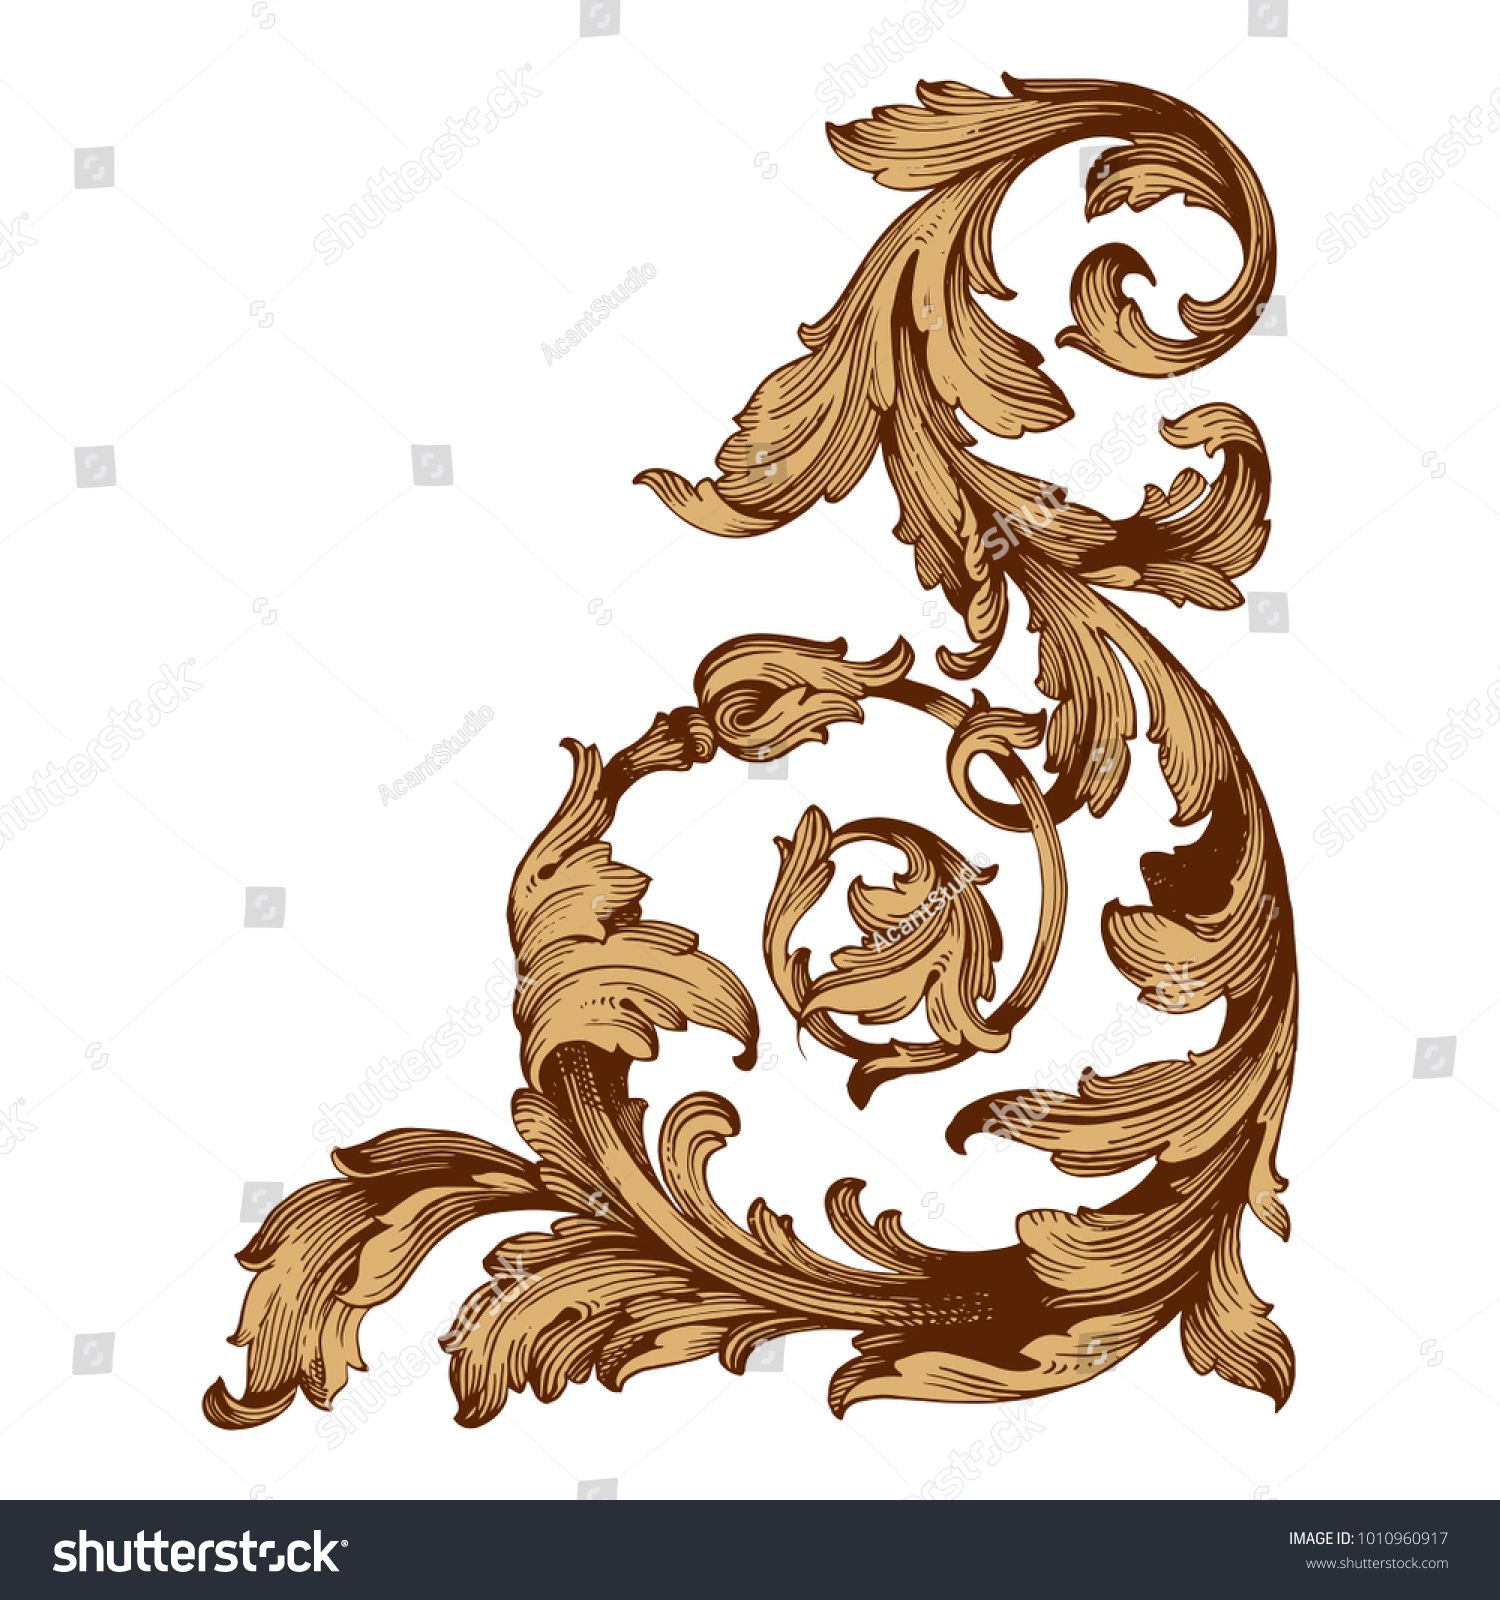 Gold Vintage Baroque Ornament Retro Pattern Antique Style Acanthus Decorative Design Element Filigree Calligraph Baroque Ornament Baroque Frames Retro Pattern